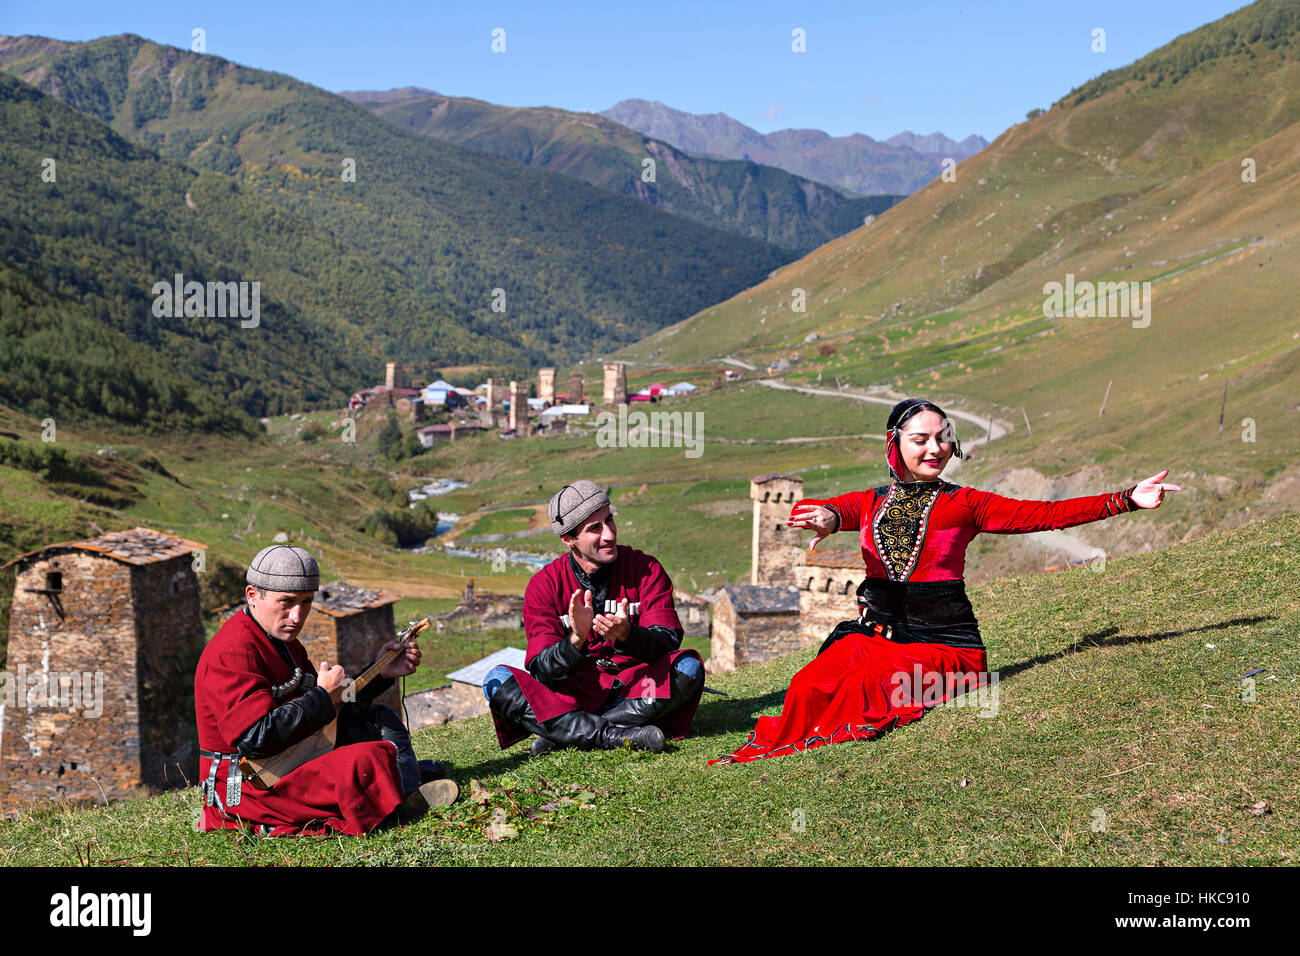 Georgian Souvenirs Stock Photos Georgian Souvenirs Stock: Georgian People In National Costumes Sing And Dance In